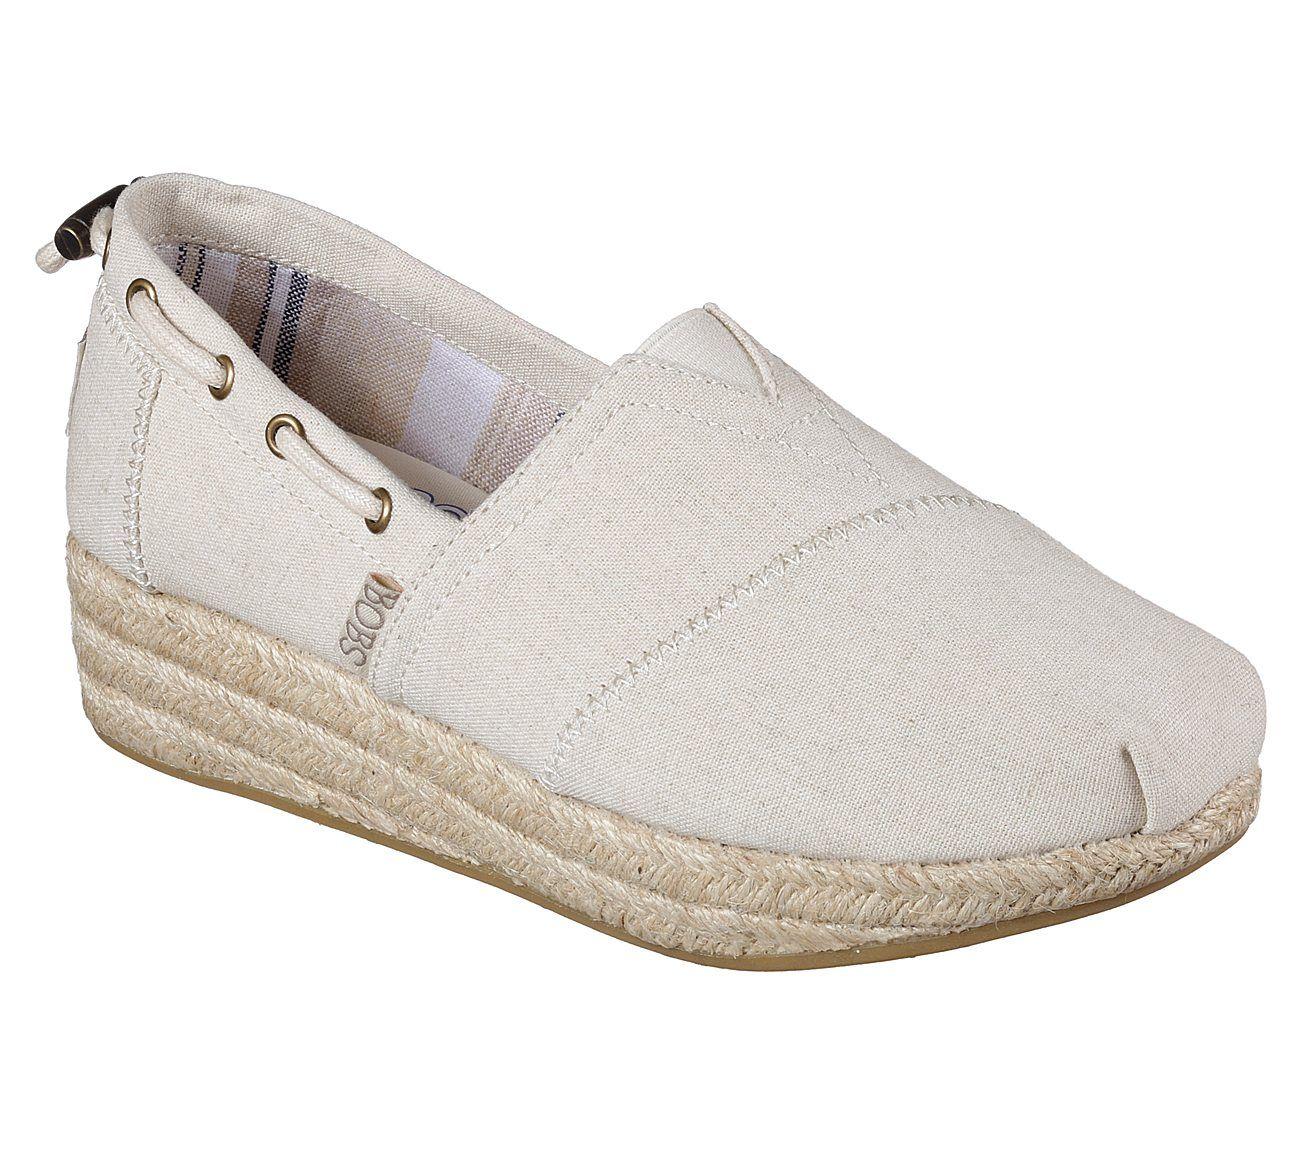 Bobs Highlights Set Sail Cute Shoes Slip On Skechers